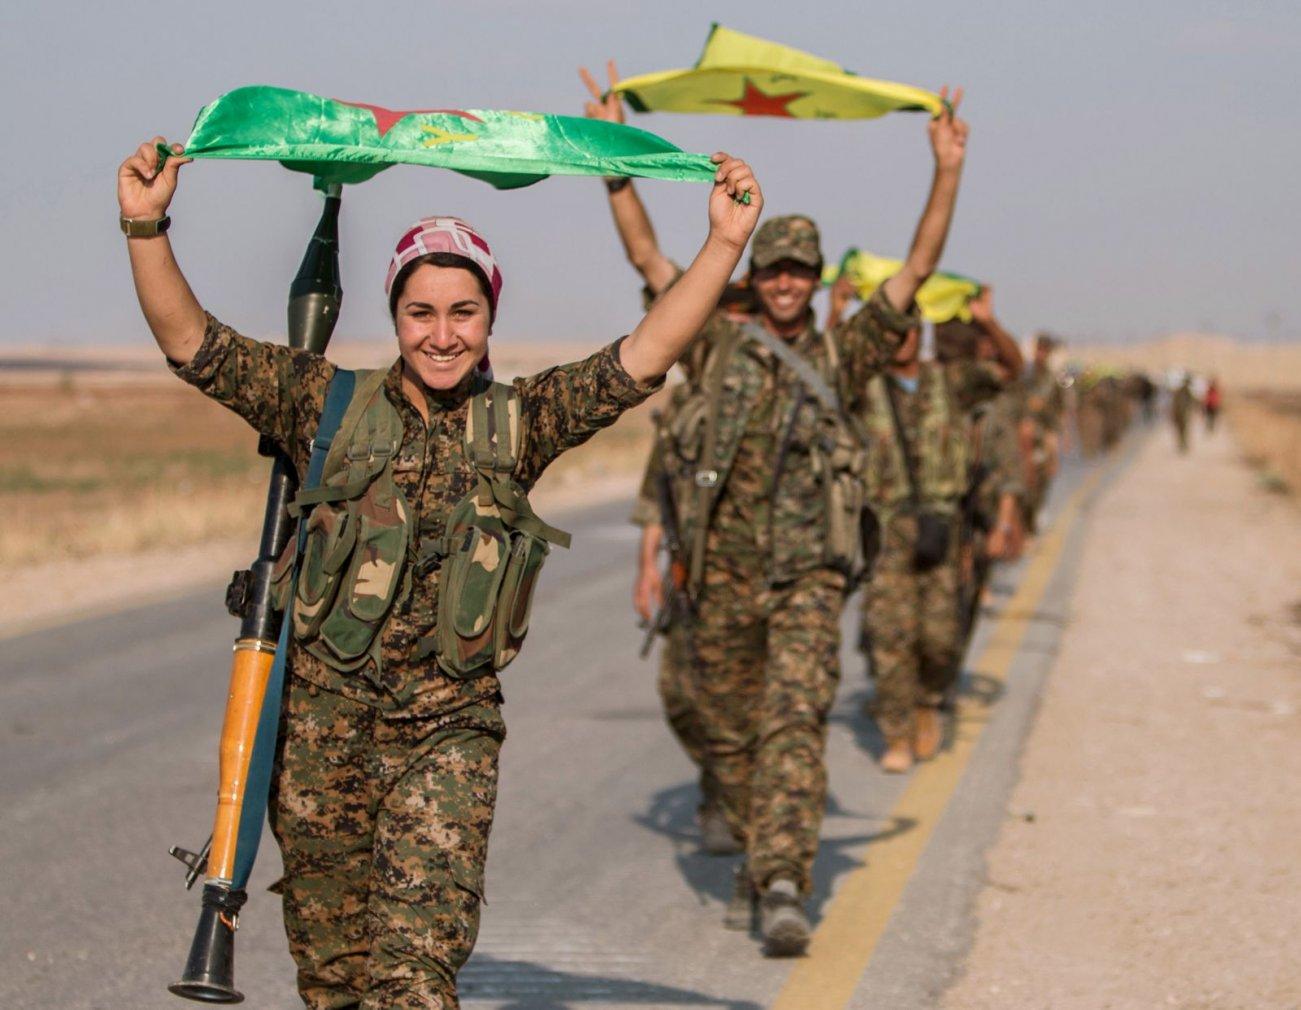 Communist ISIS Antifa: Homeland Security's Confused Pursuit of Pro-Kurdish Americans